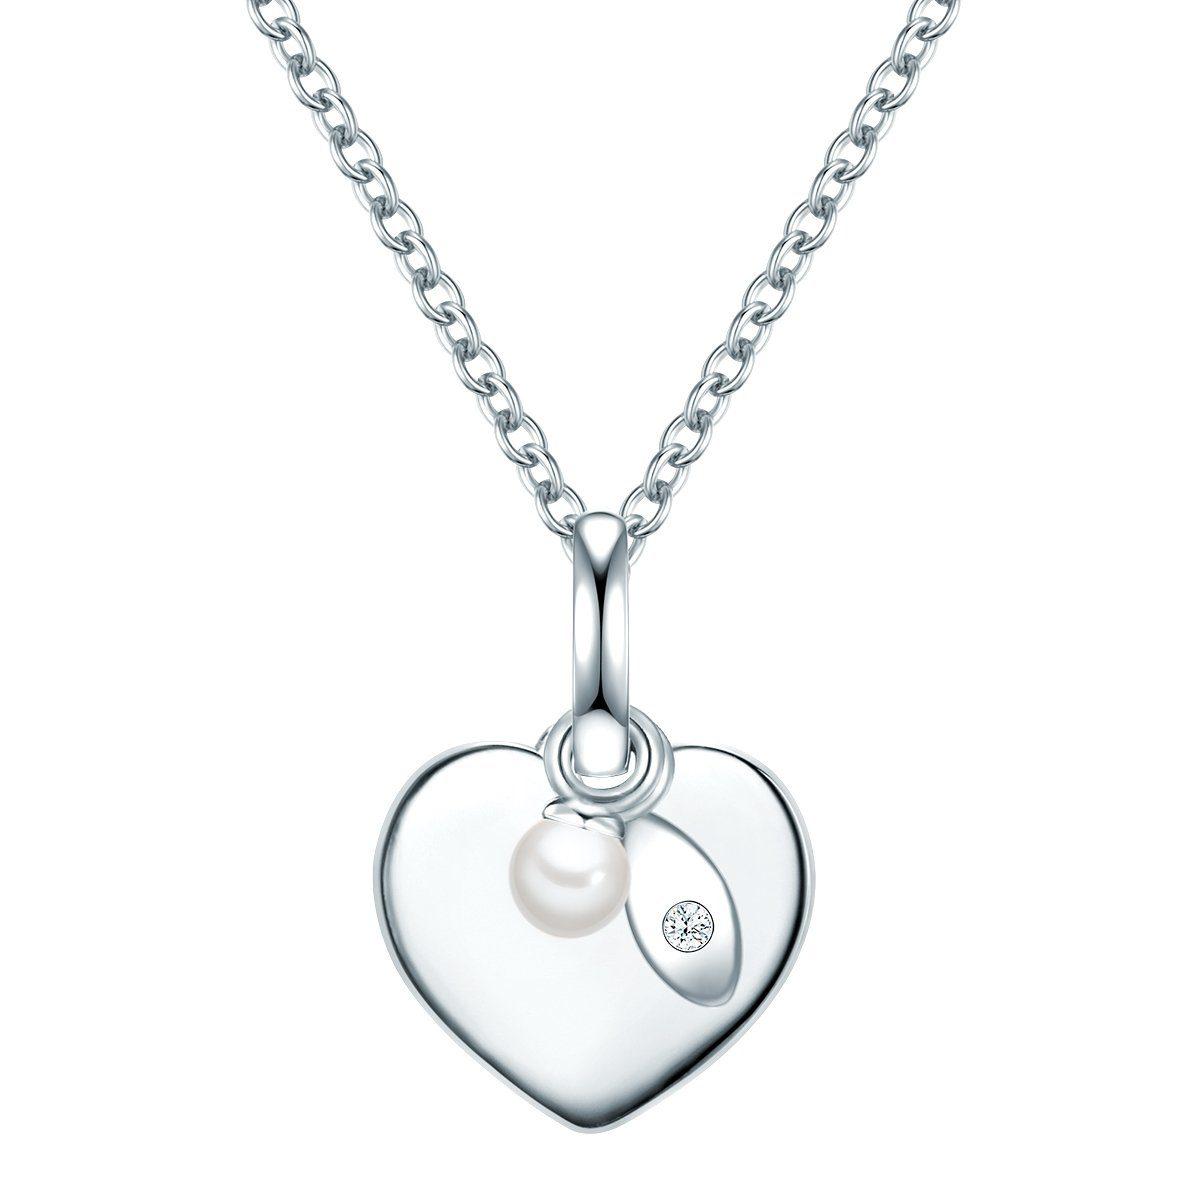 Valero Pearls Gliederkette Y901   Schmuck > Halsketten > Gliederketten   Valero Pearls